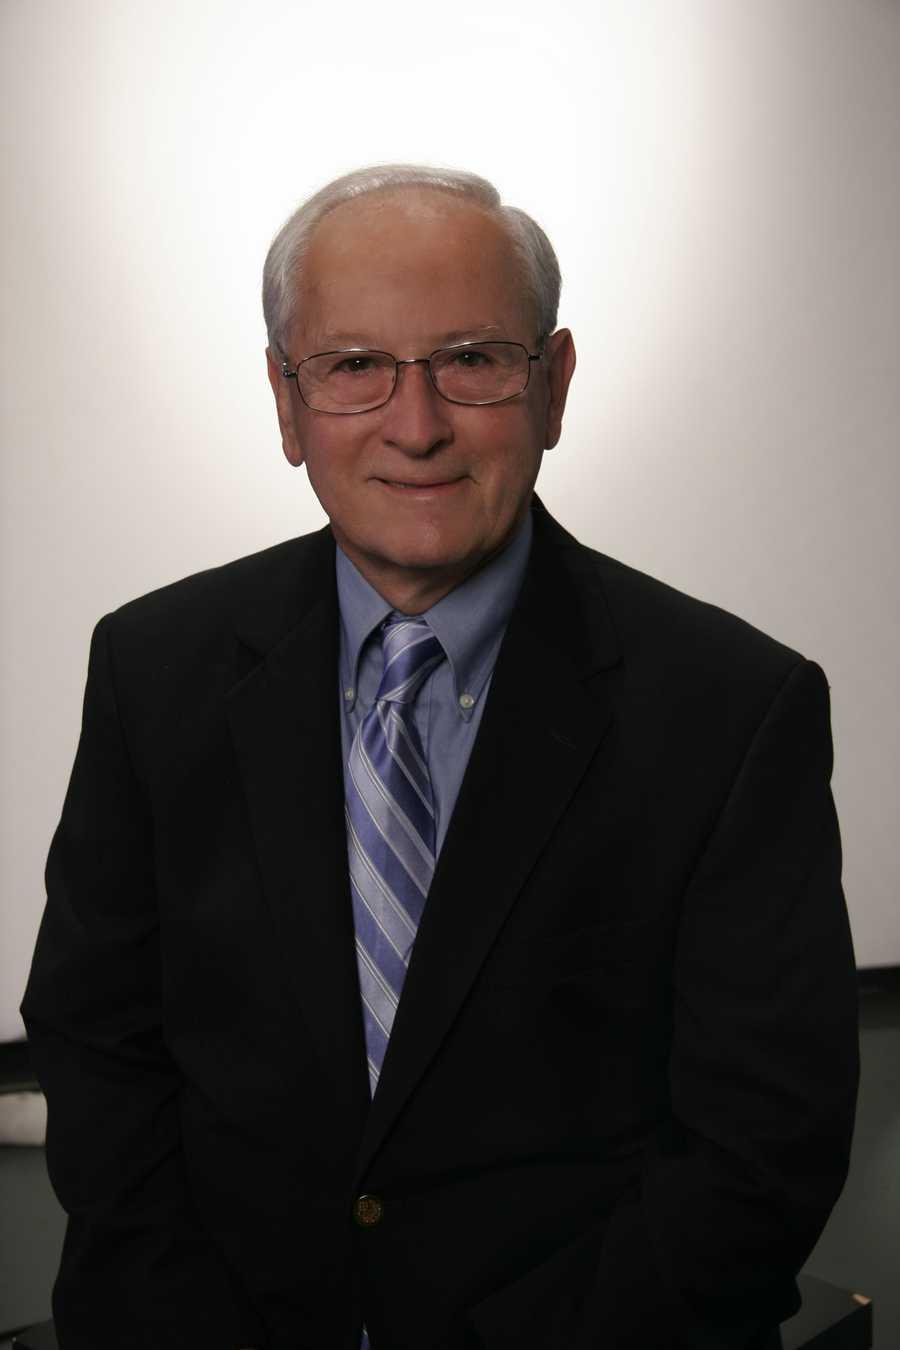 Dr. Manuel Grimaldi